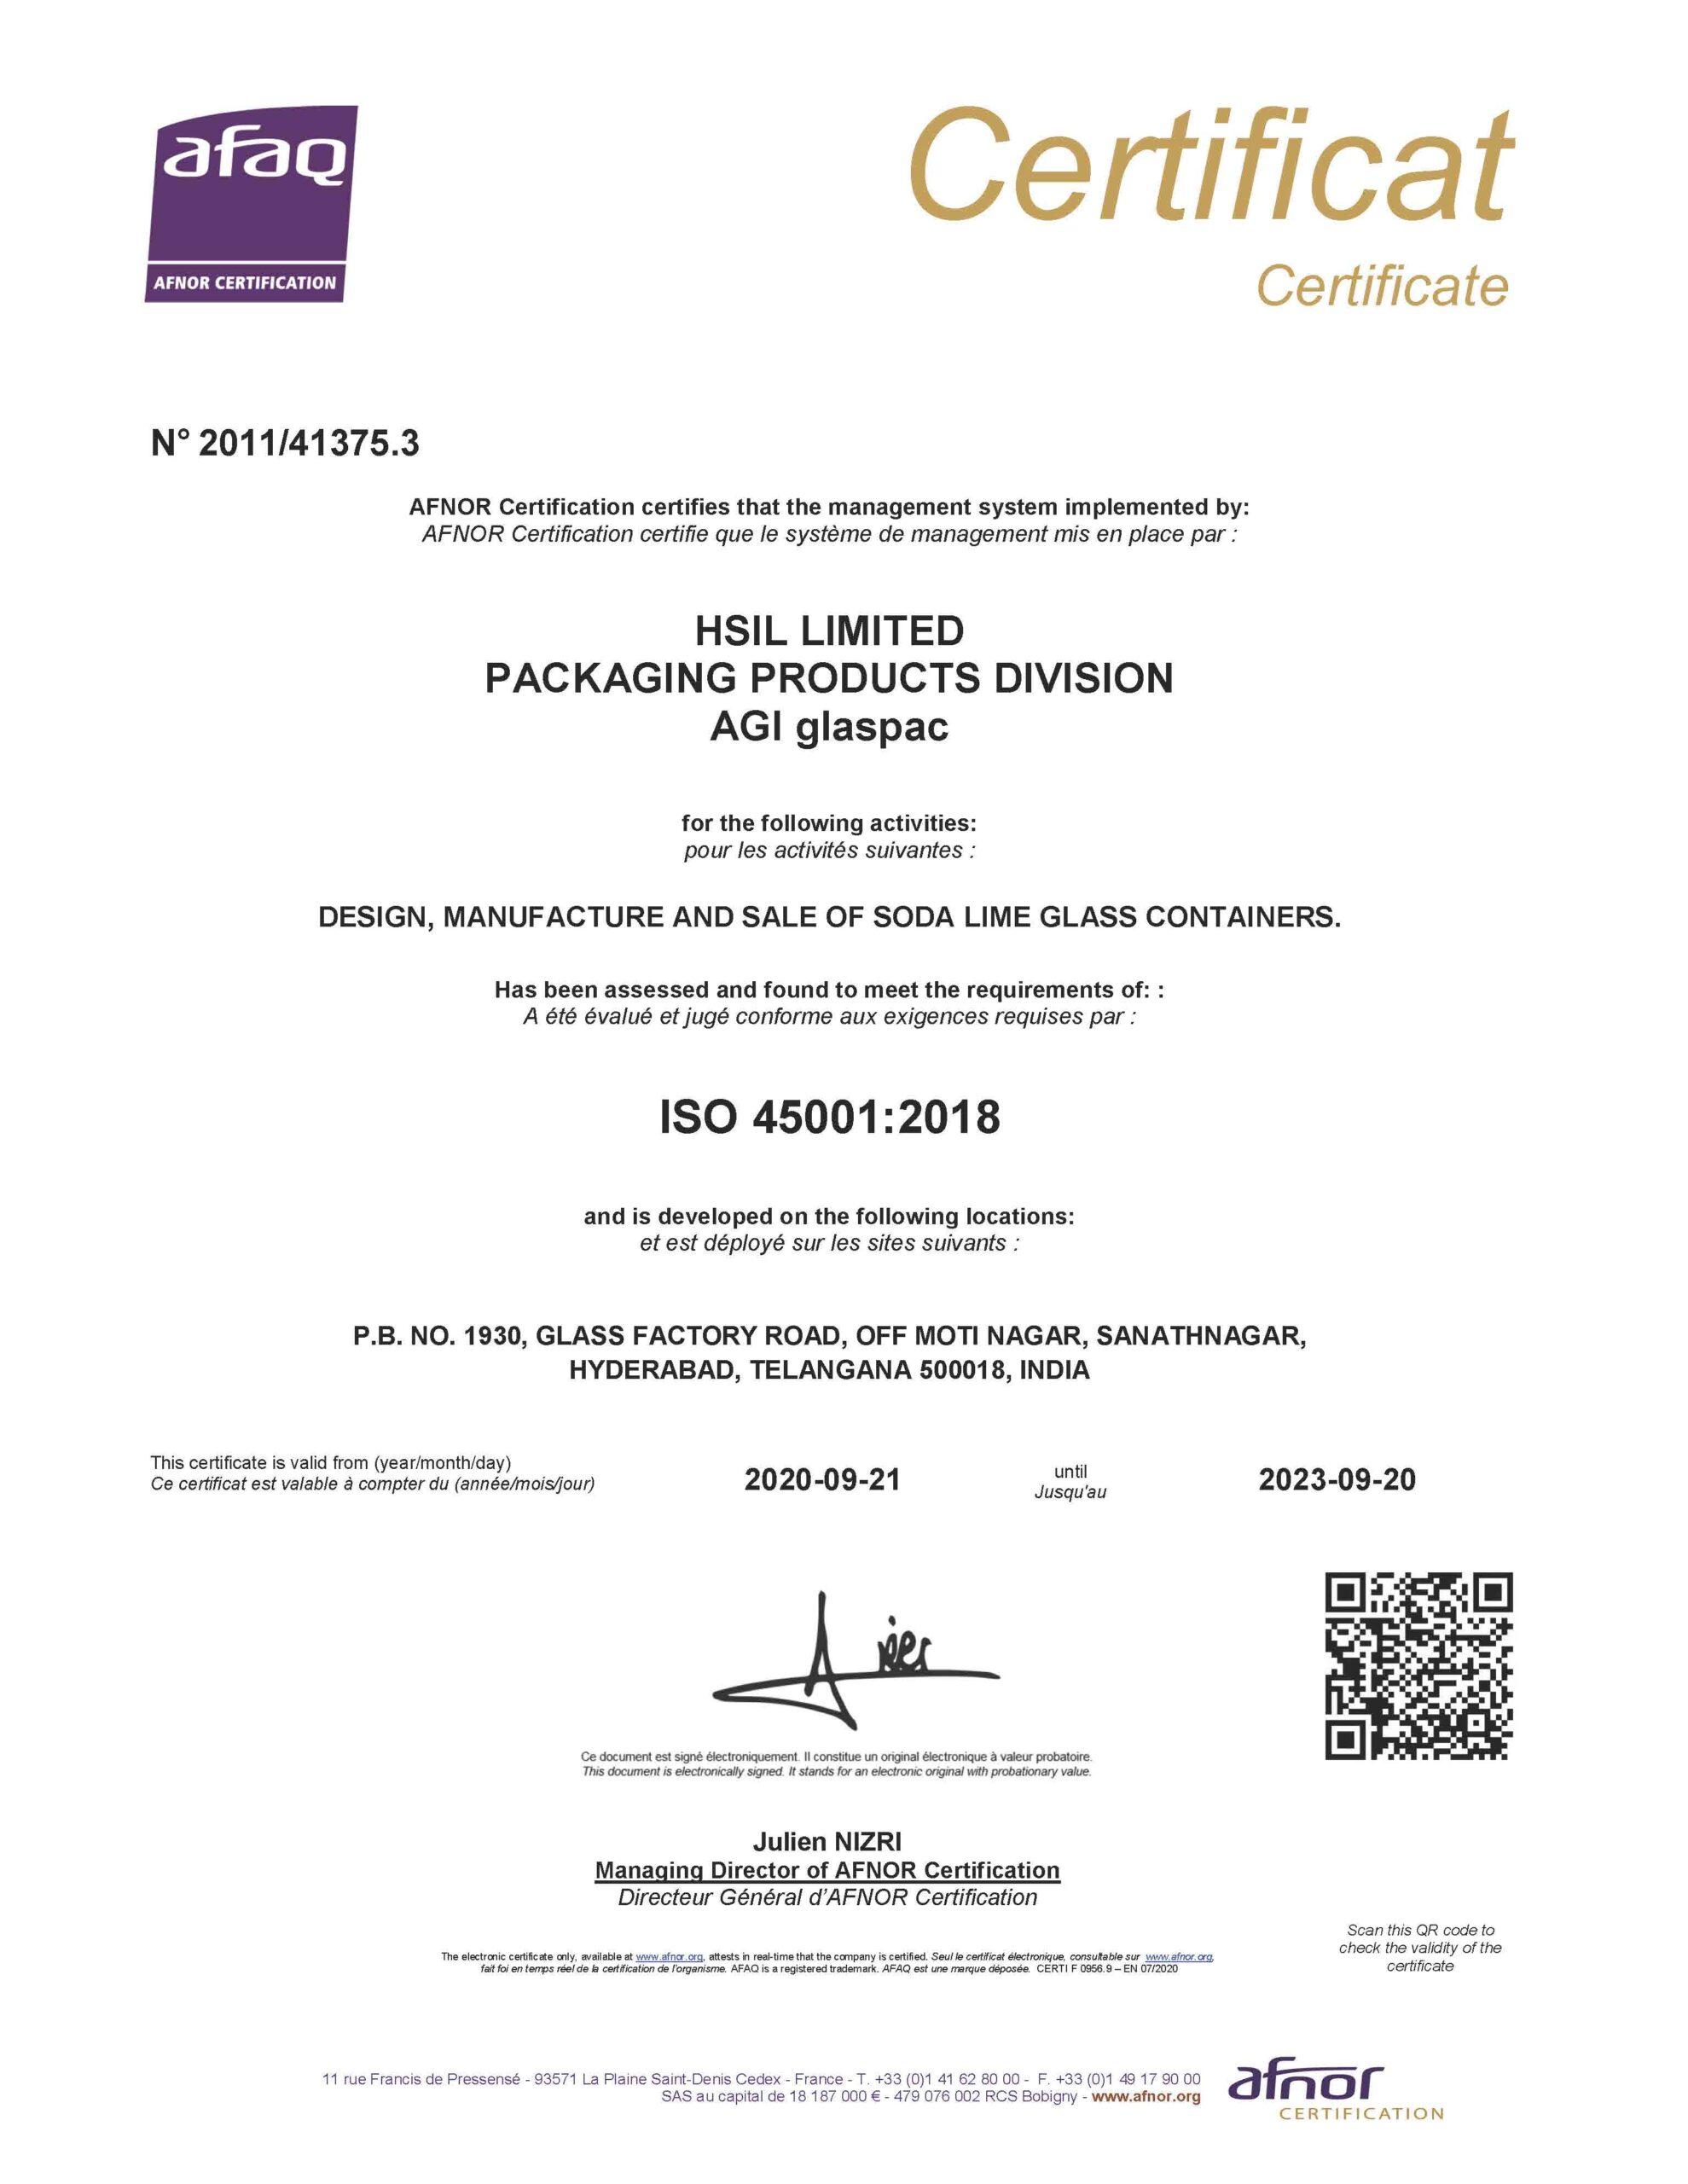 had certificate 4